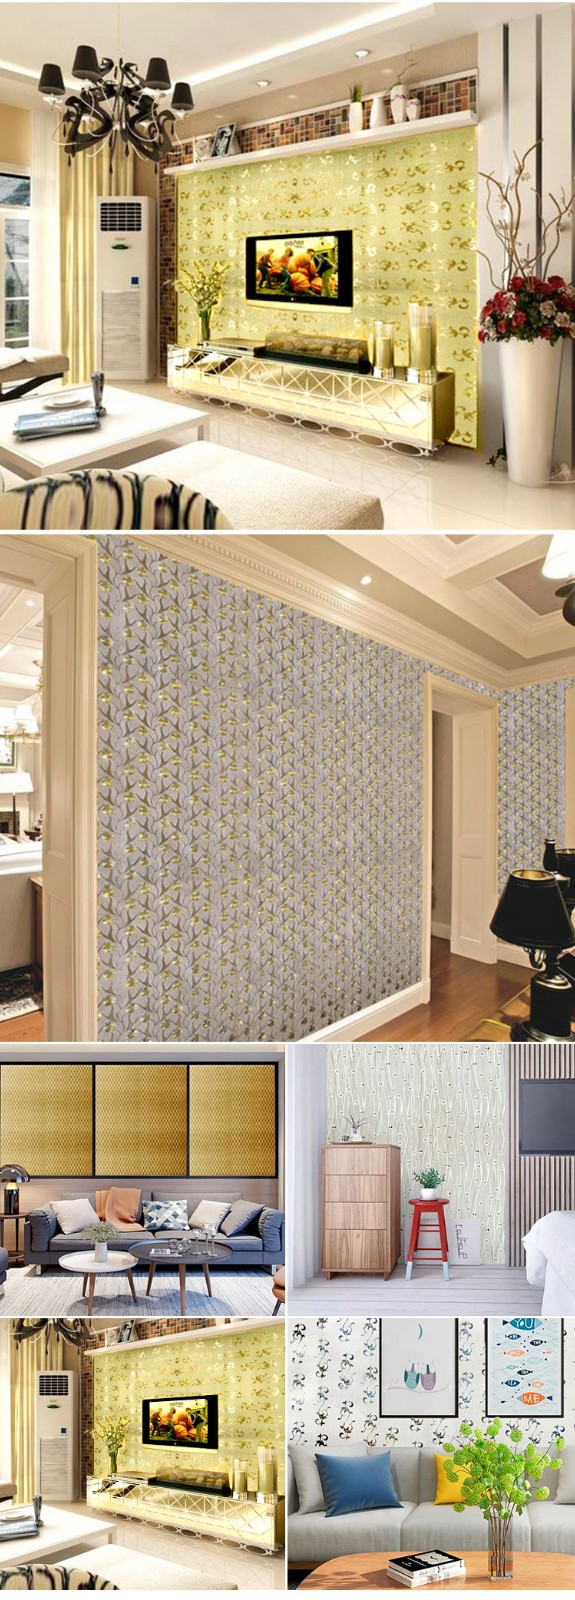 SUNYE decorative kitchen backsplash supply bulk production-6